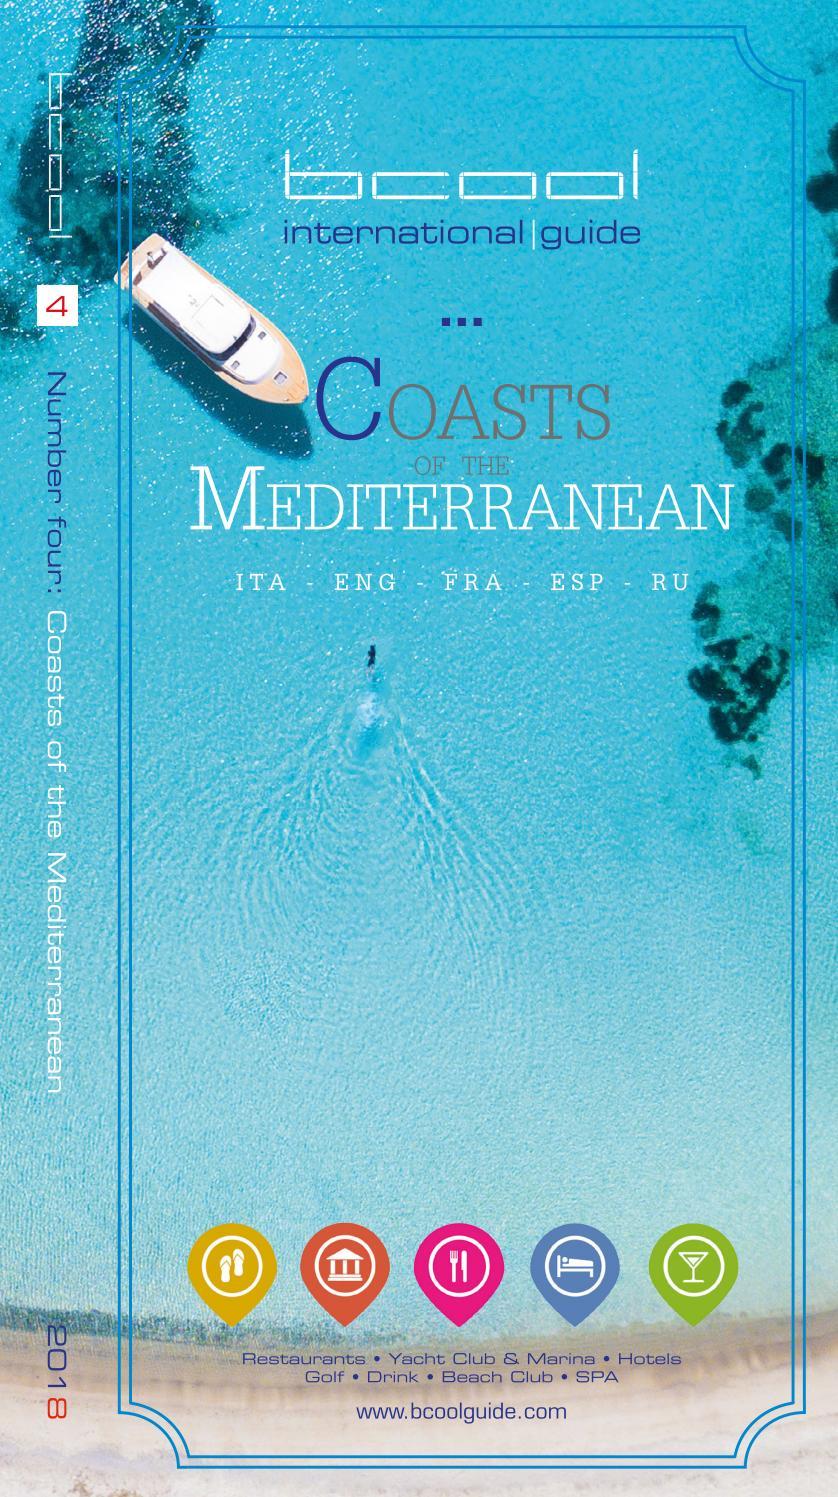 "Table De Jardin En Fer Best Of 2018 Bcool Guide ""coasts Of the Mediterrean"" by Bcool City Of 30 Génial Table De Jardin En Fer"